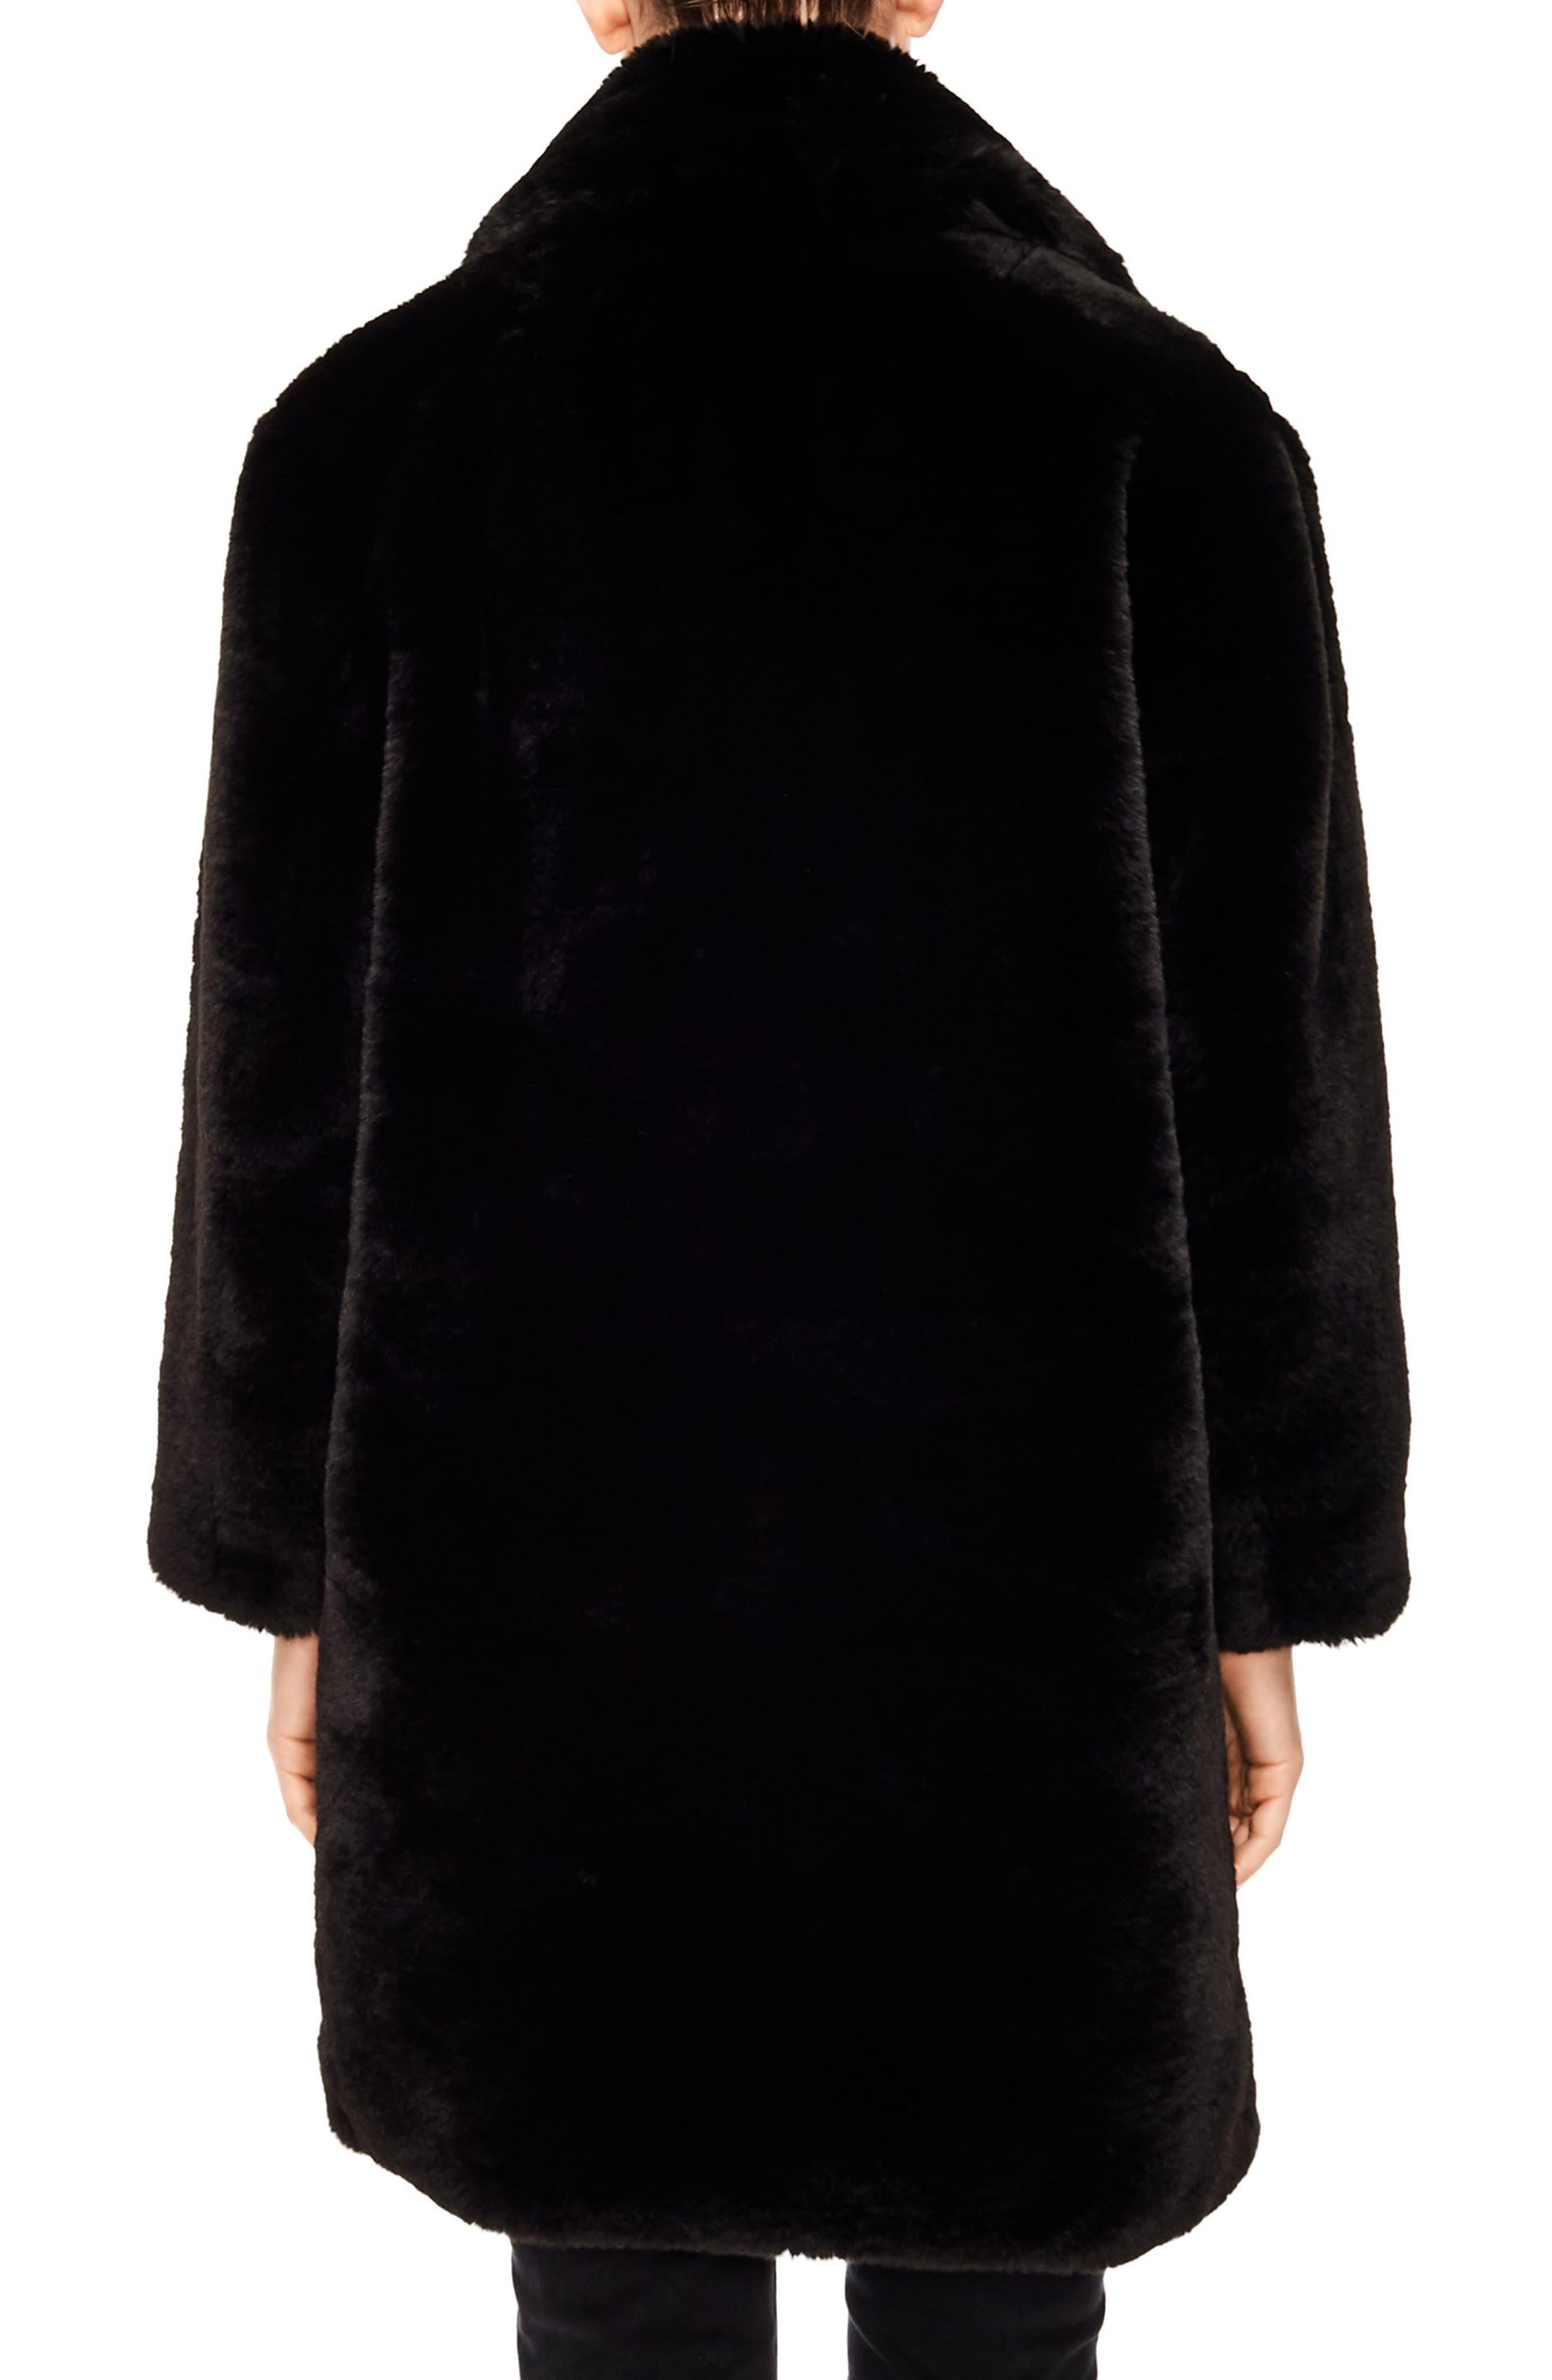 Ballote Faux Fur Coat,                             Alternate thumbnail 2, color,                             BLACK